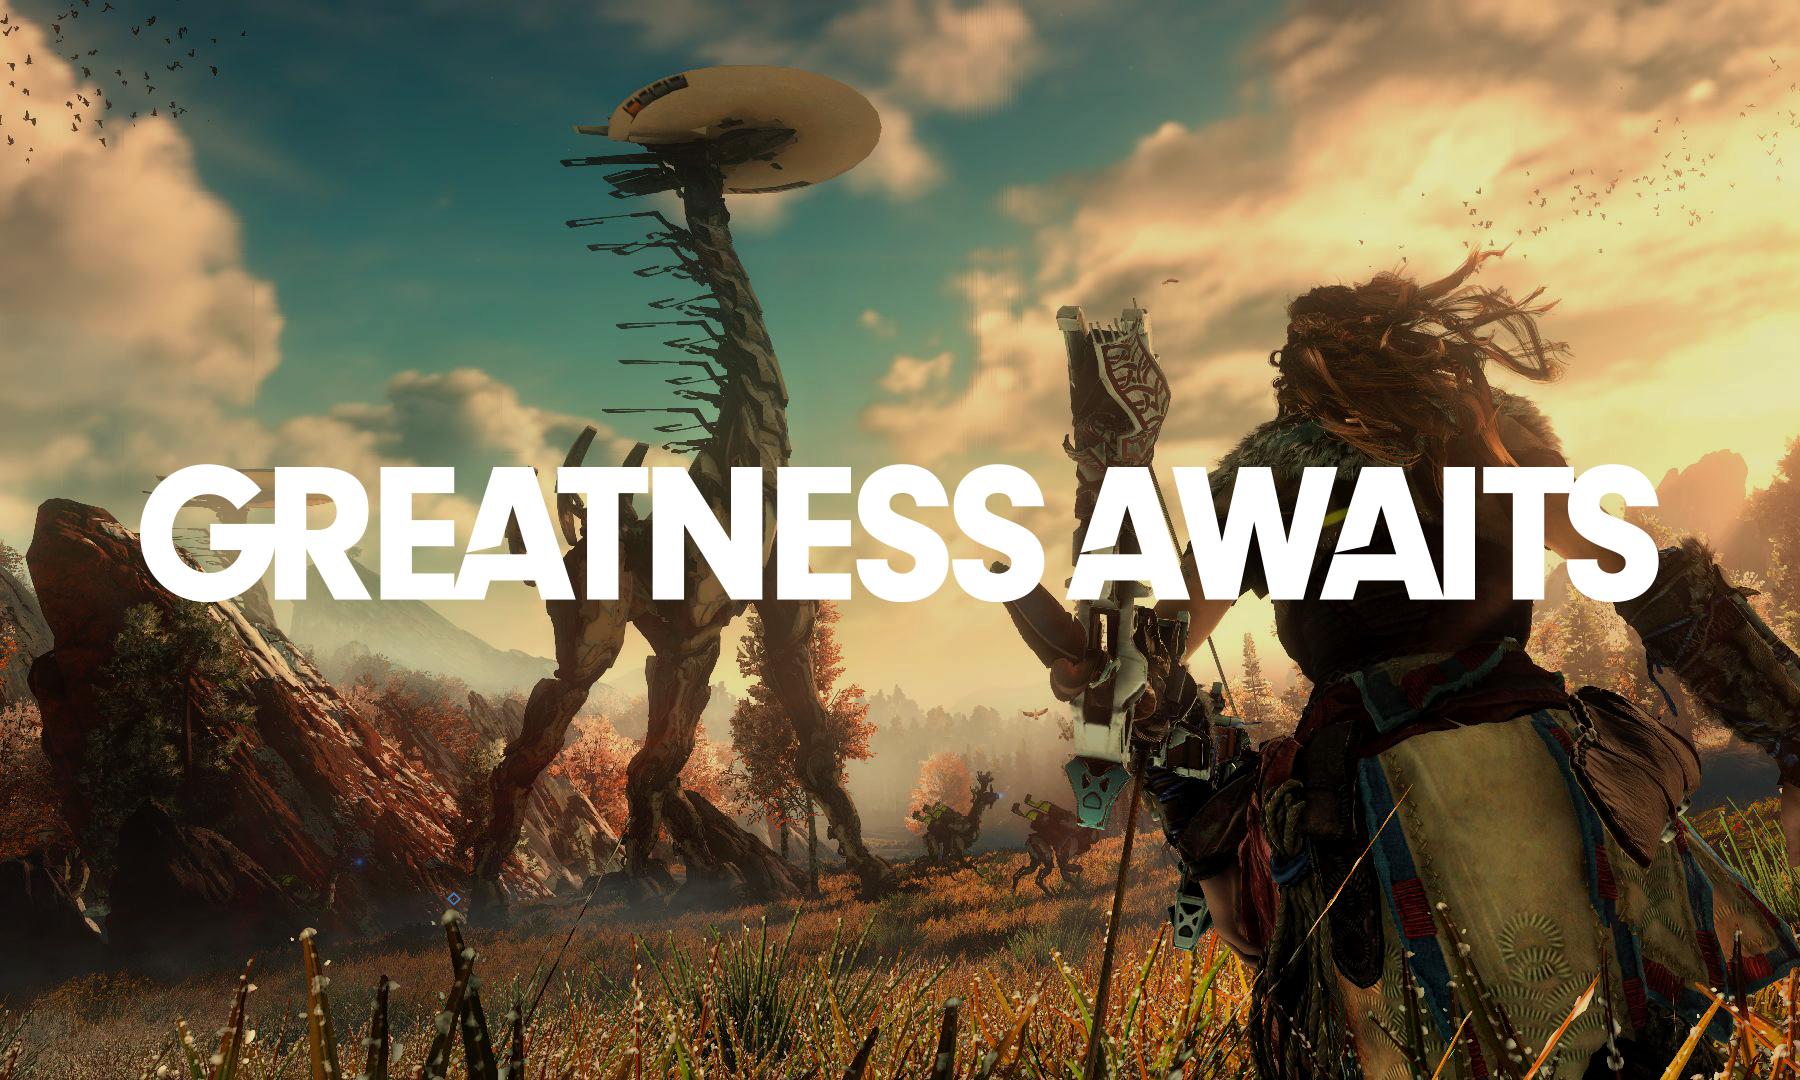 Greatness Awaits template 03.jpg